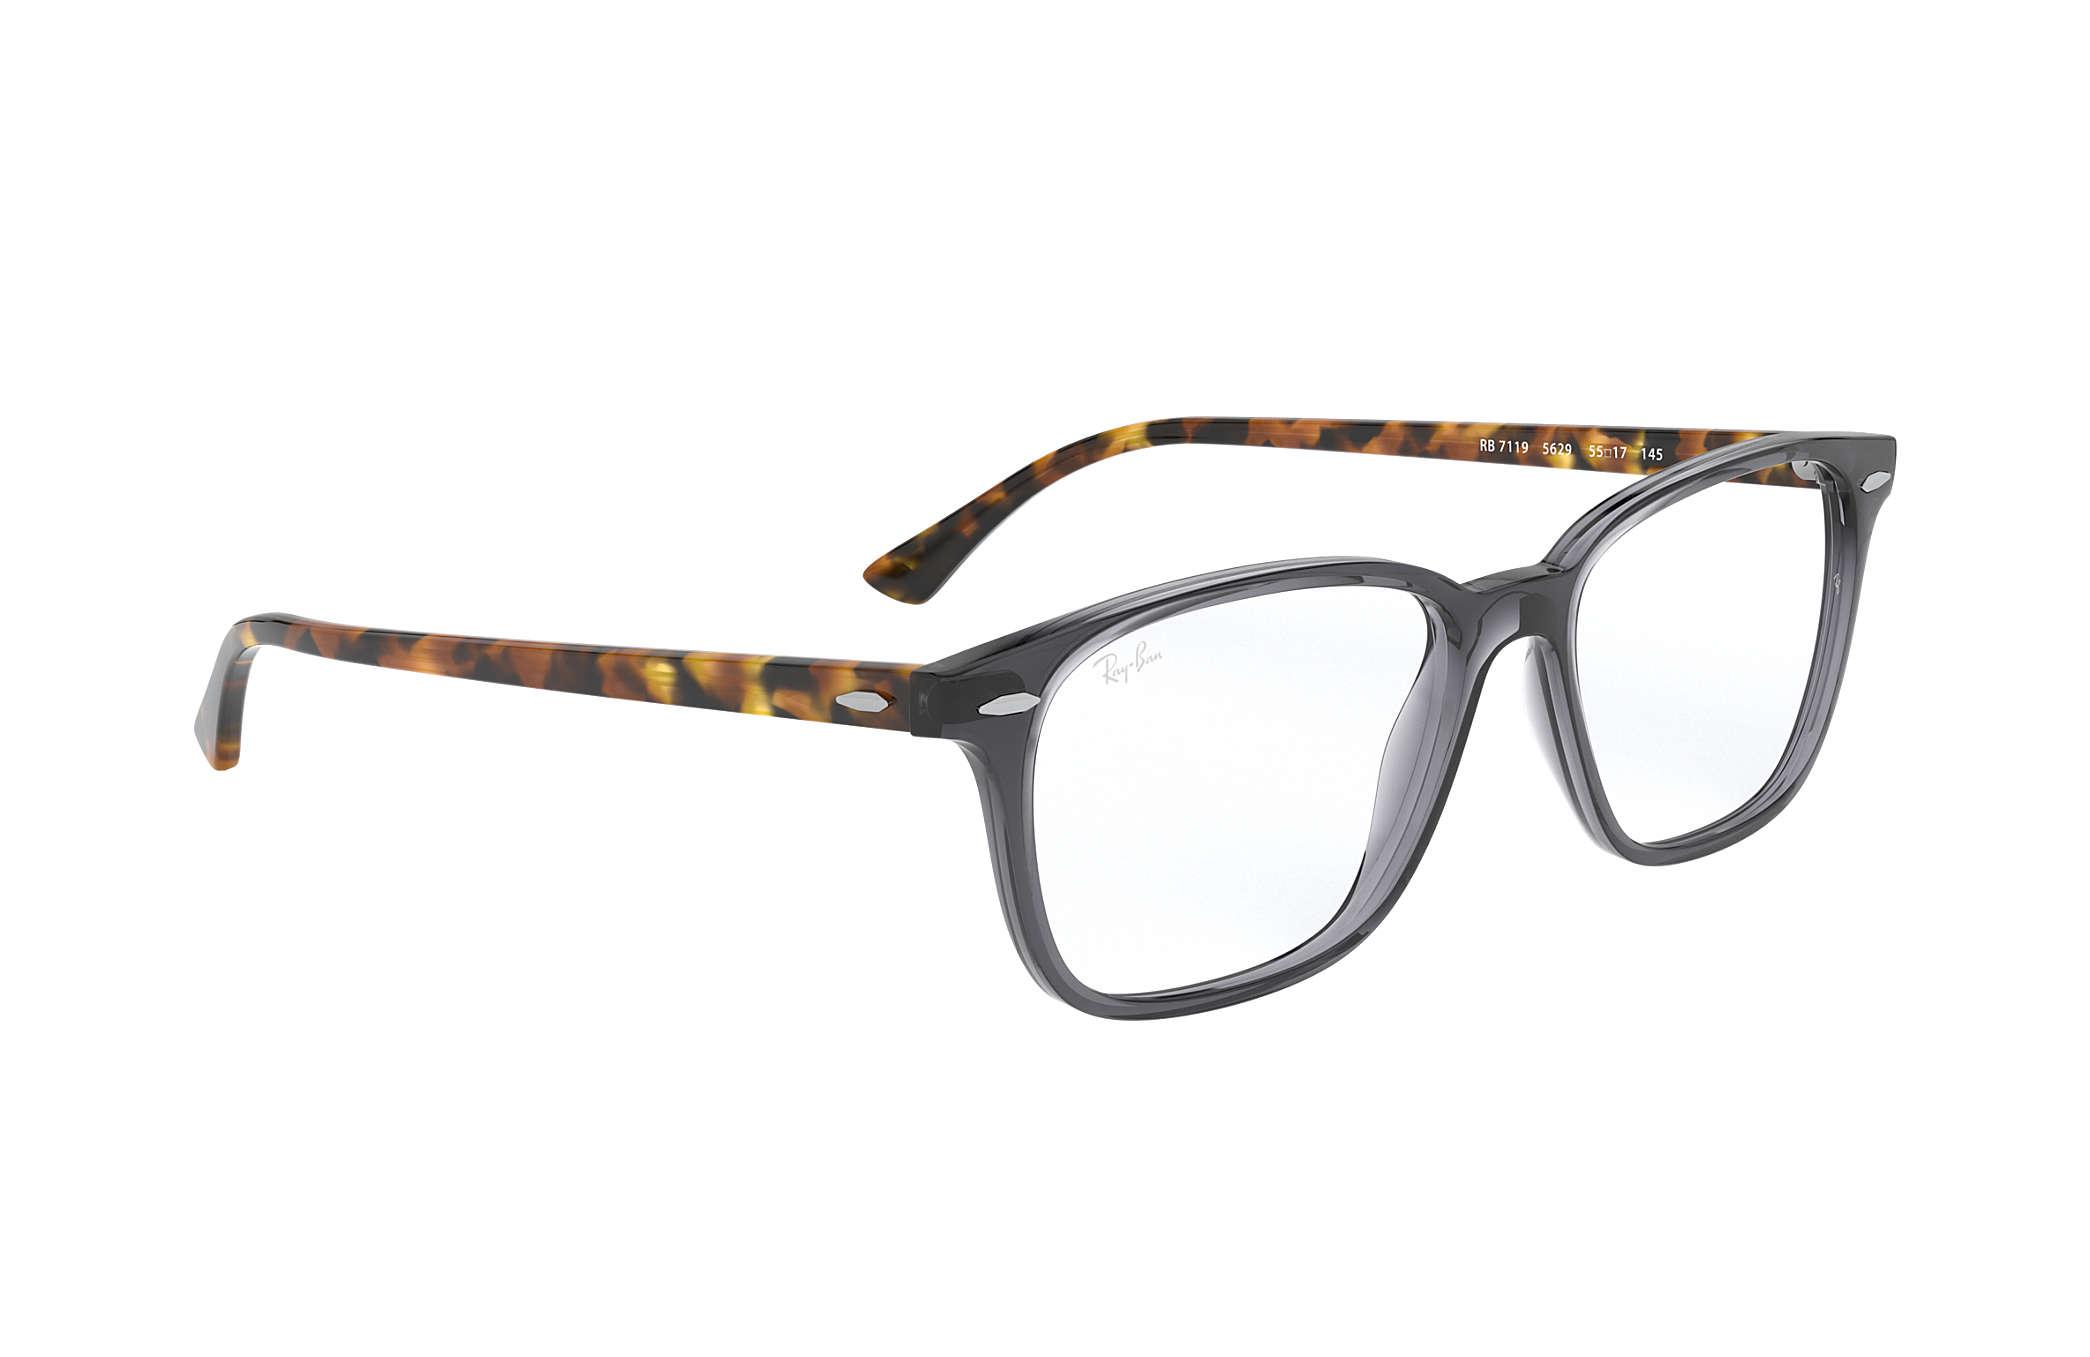 d394ae0731 Ray-Ban prescription glasses RB7119 Grey - Propionate ...